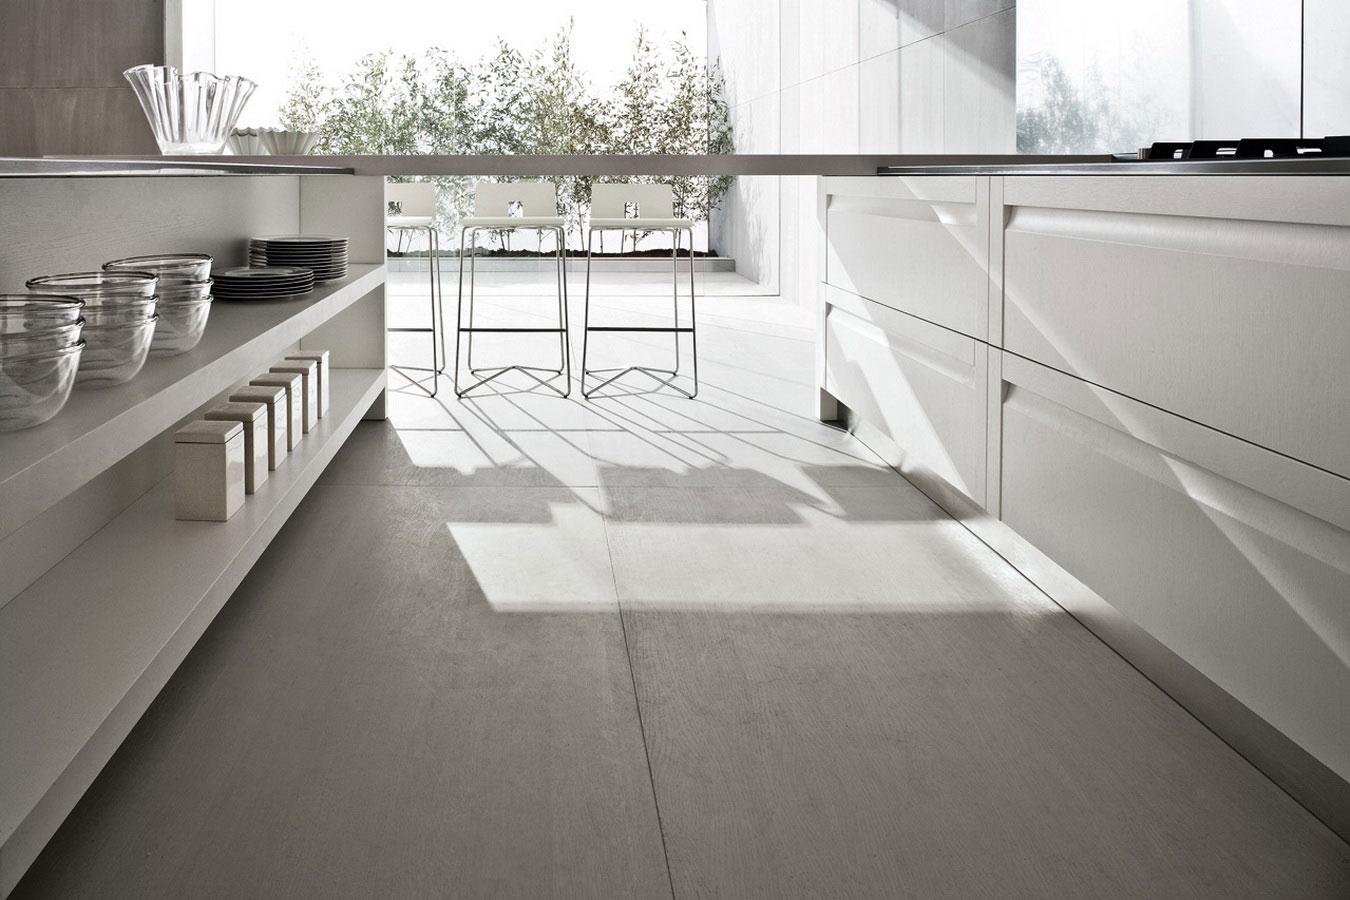 Stunning mobili usati treviso contemporary for Subito it novara arredamento